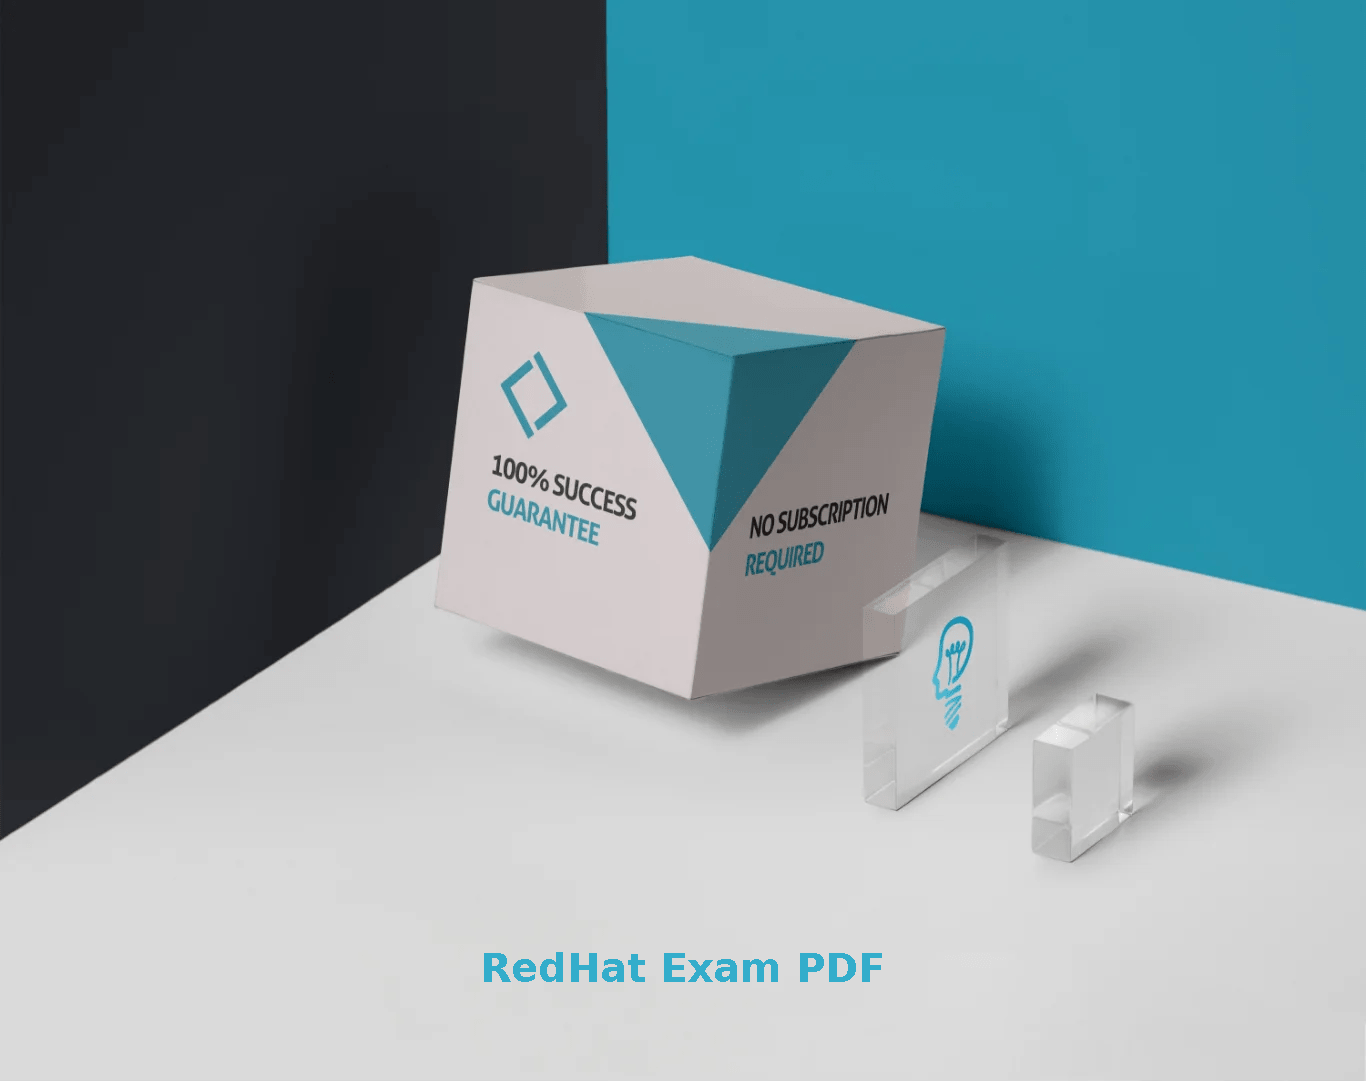 RedHat Exam PDF